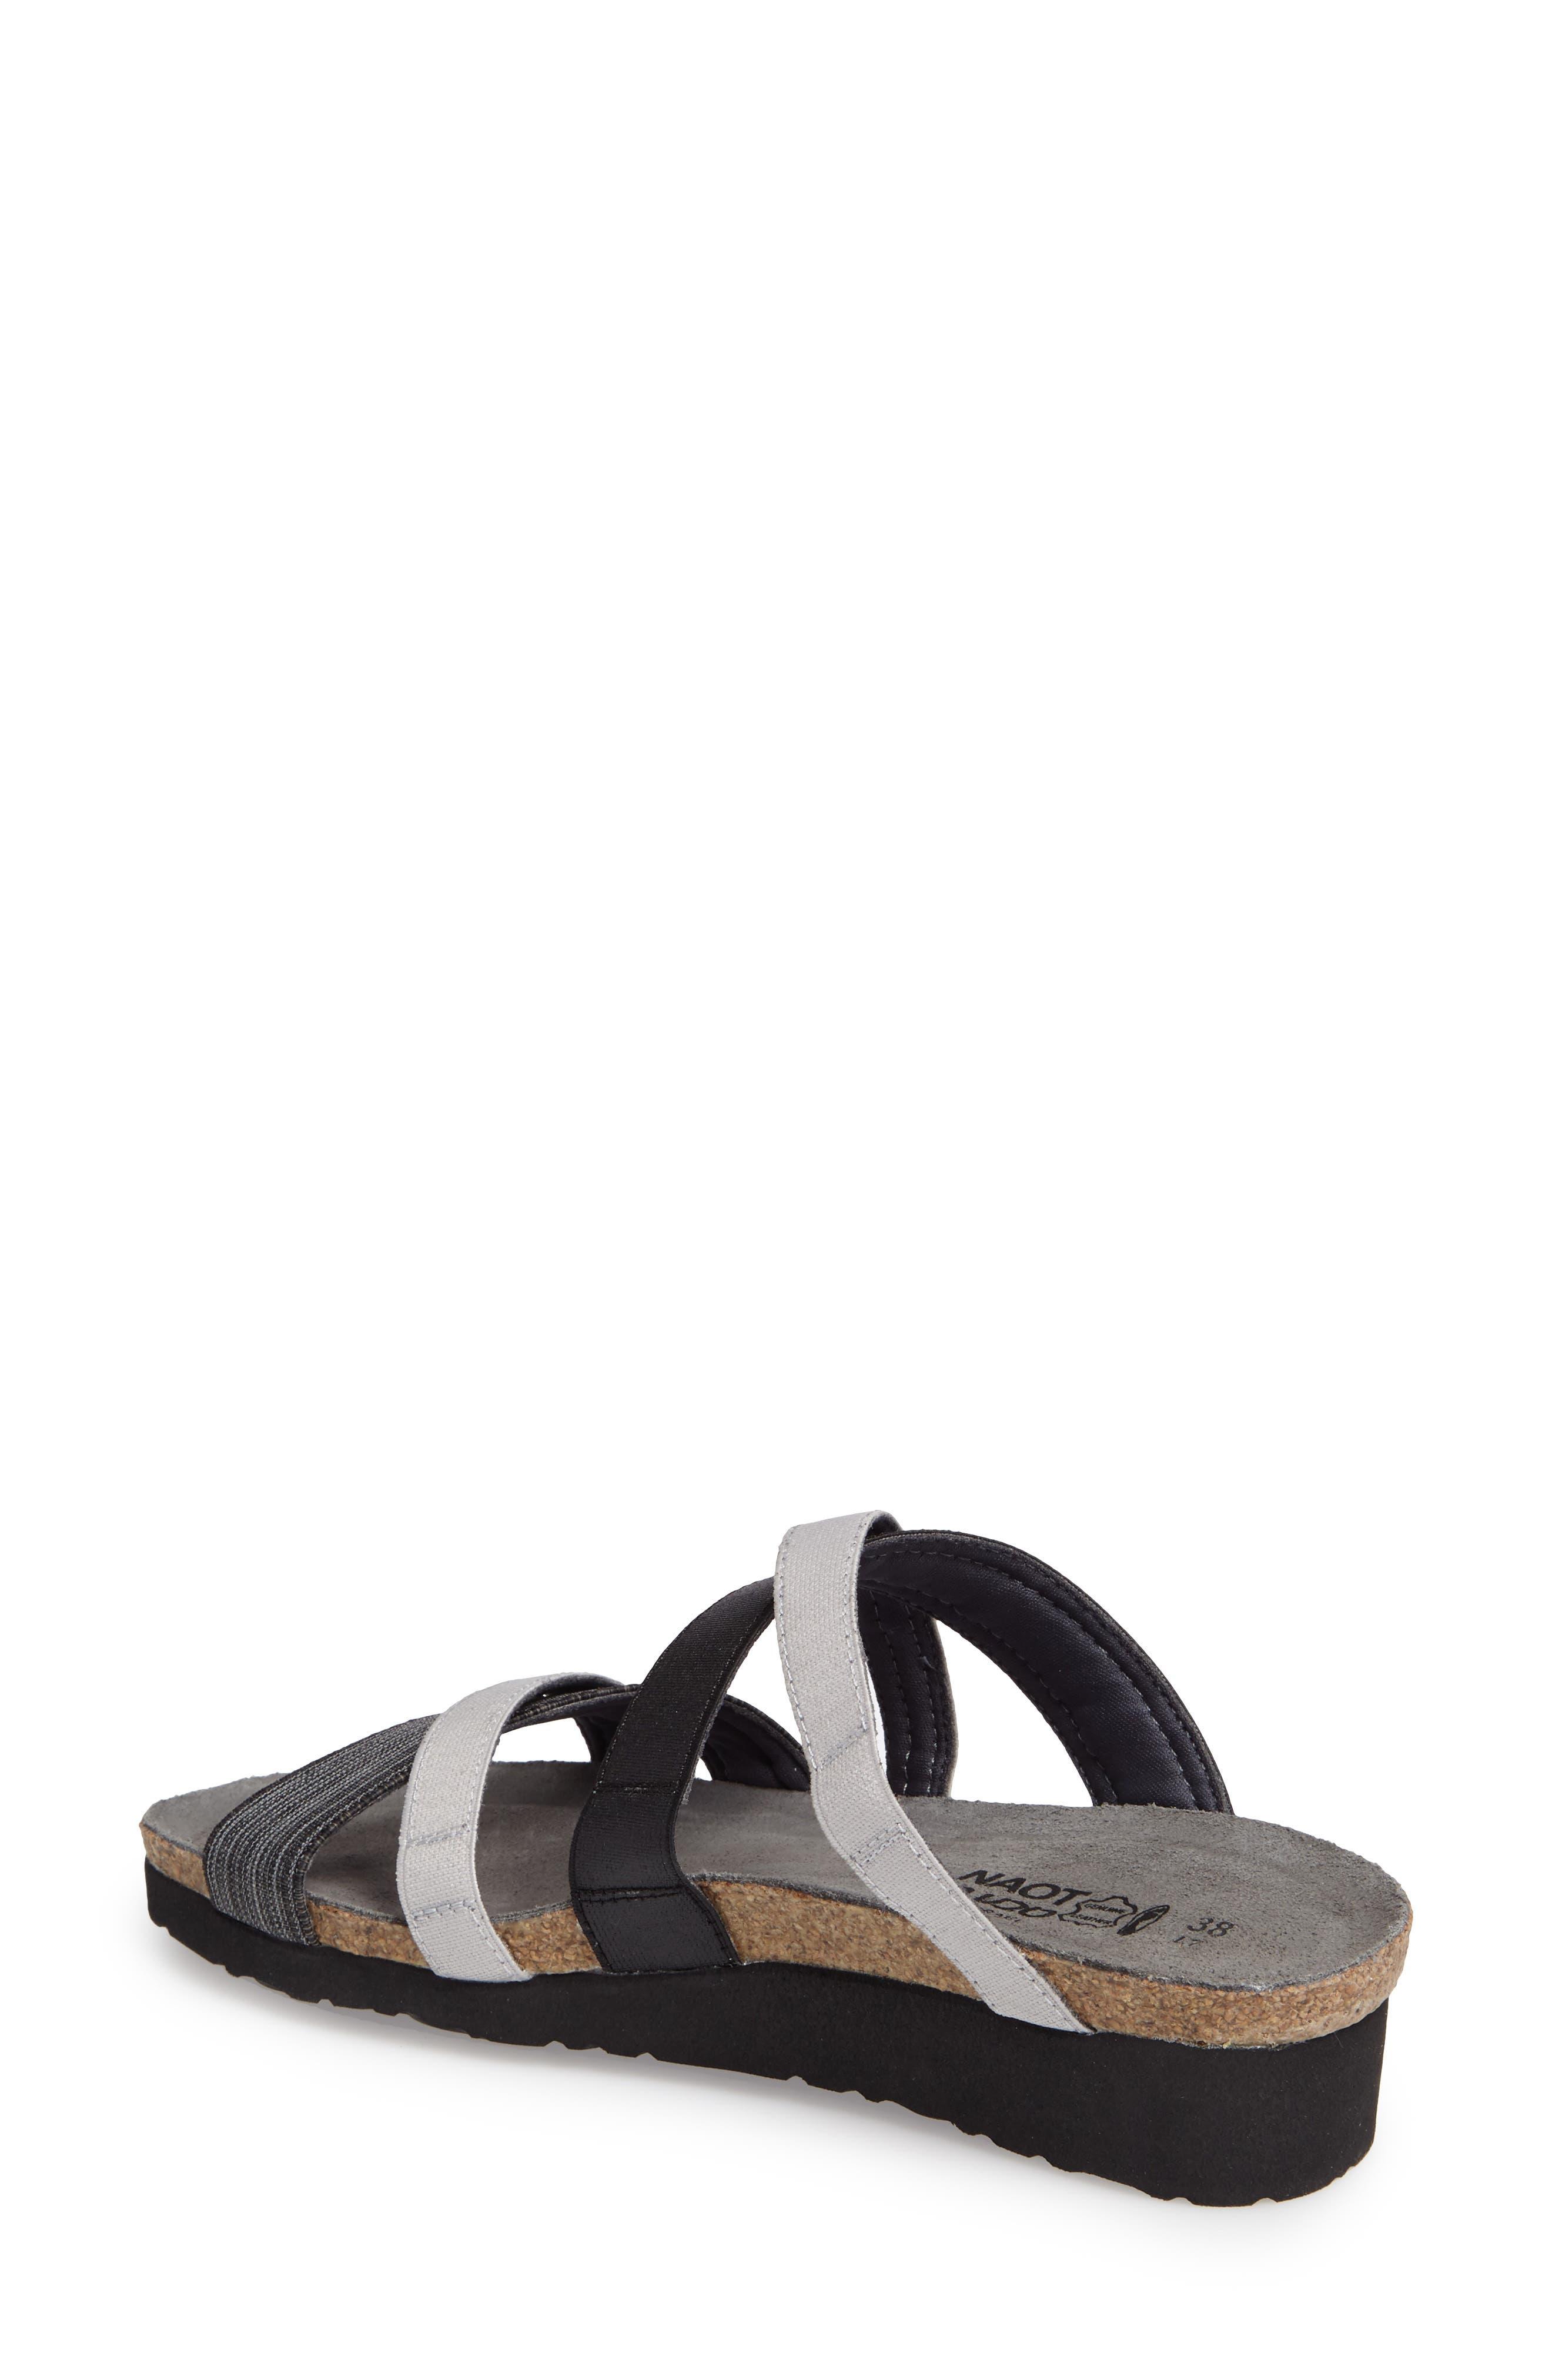 NAOT, Roxana Strappy Slip-On Sandal, Alternate thumbnail 2, color, BLACK/ GREY FABRIC